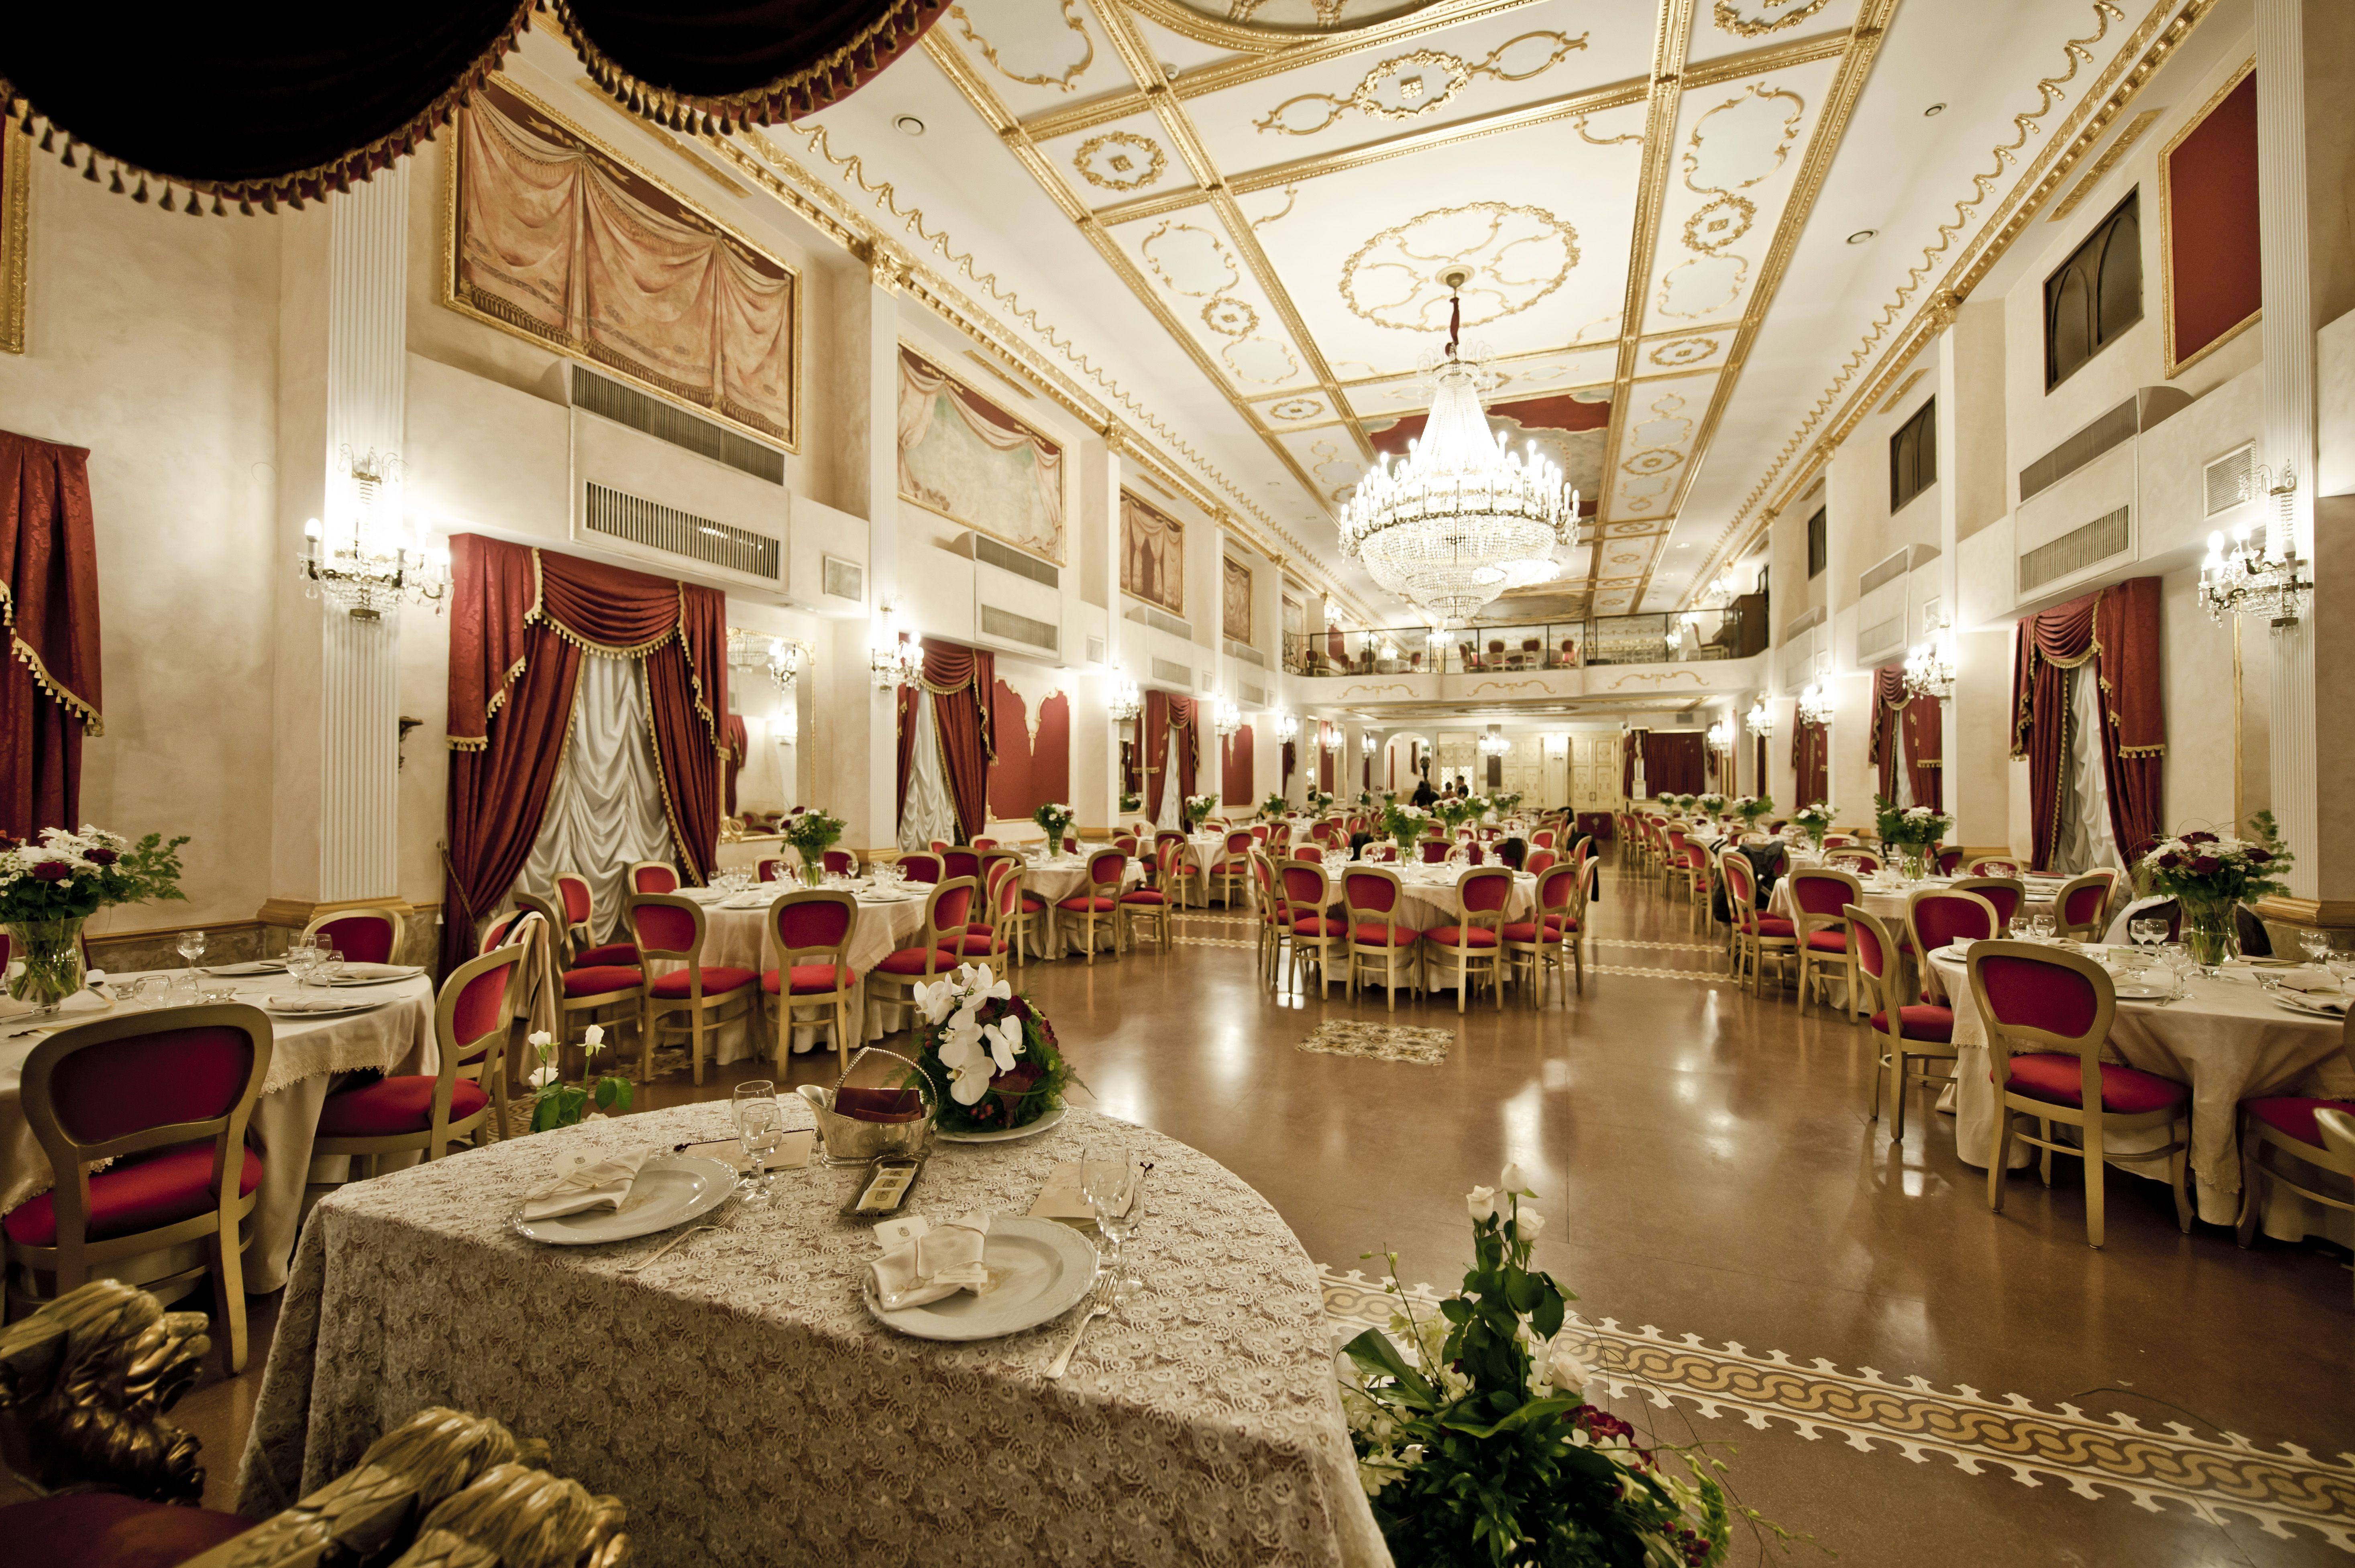 d03e92606fb7 Sec Ricevimento Nozze Ristoranti Matrimoni Castello - Querciacb